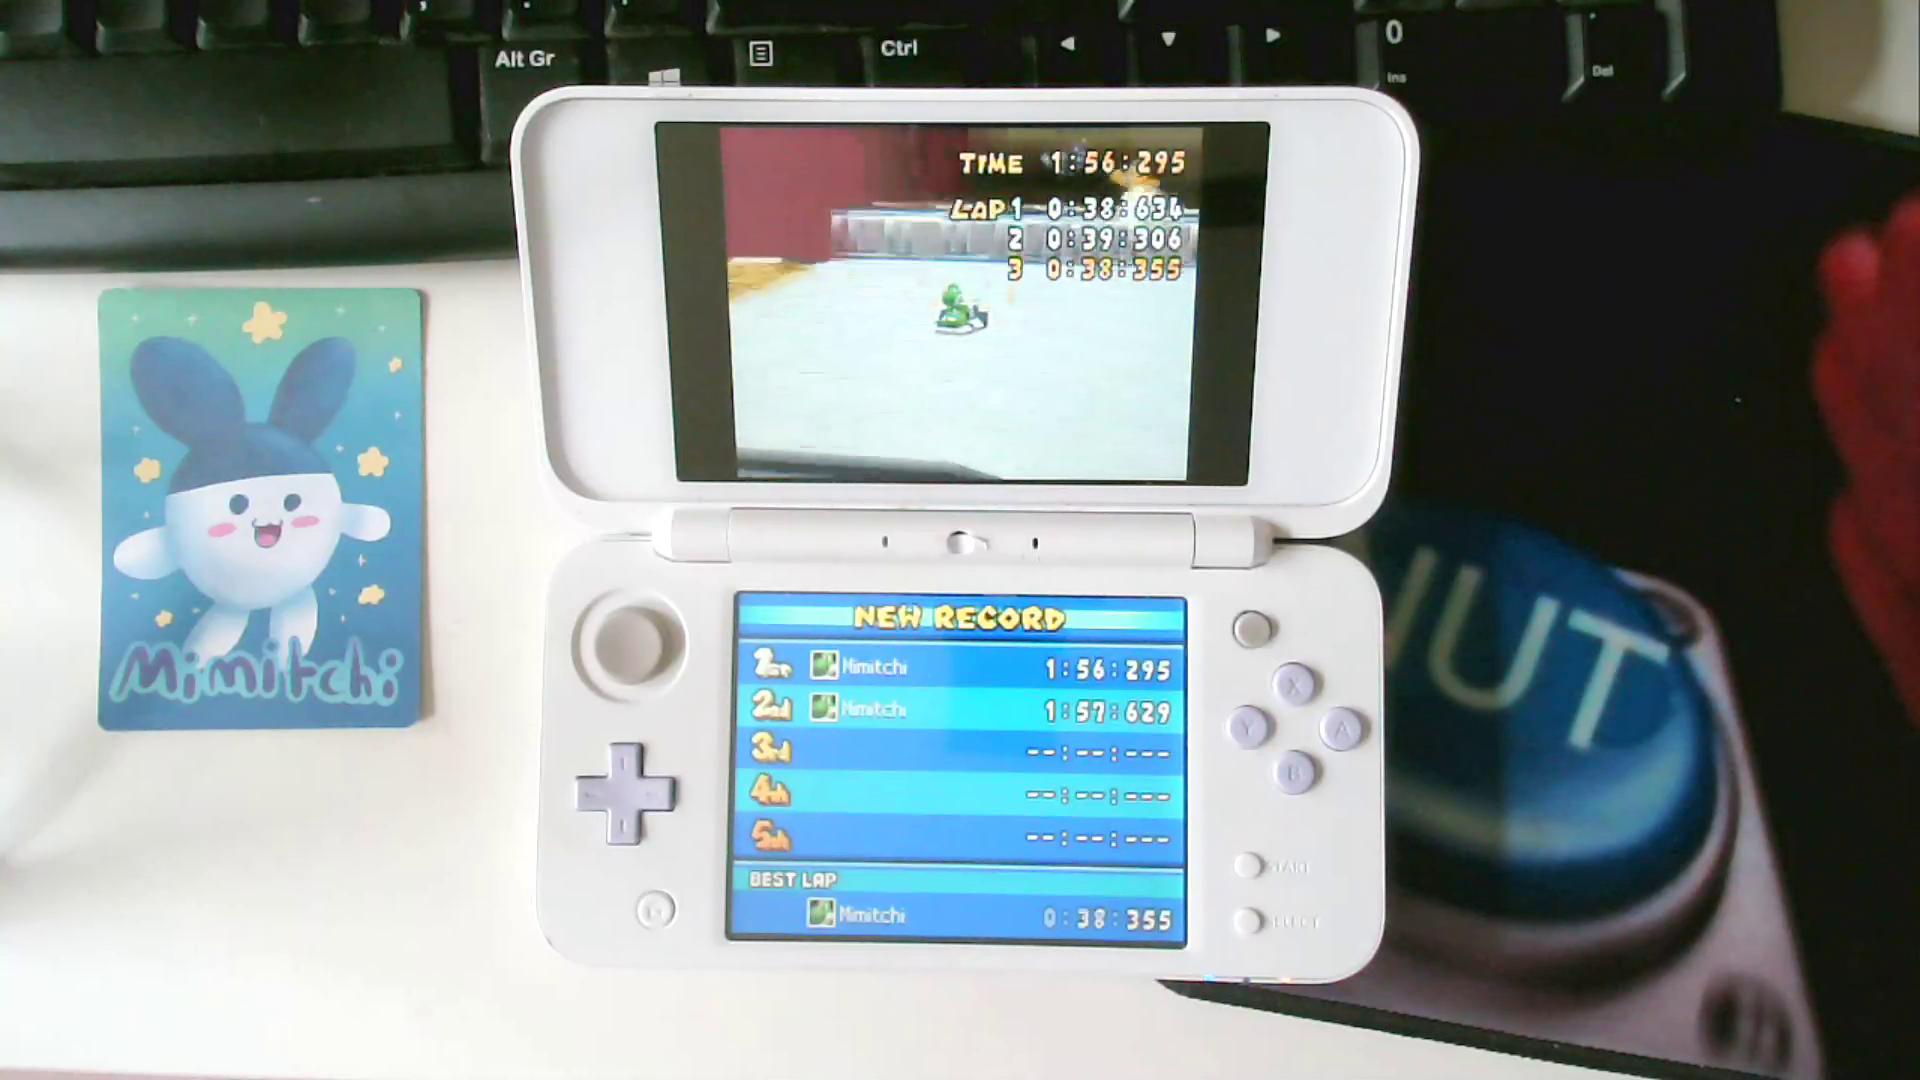 Mimitchi: Mario Kart DS: Tick-Tock Clock [Time Trial] [Lap Time] (Nintendo DS) 0:00:38.355 points on 2020-07-04 05:50:12